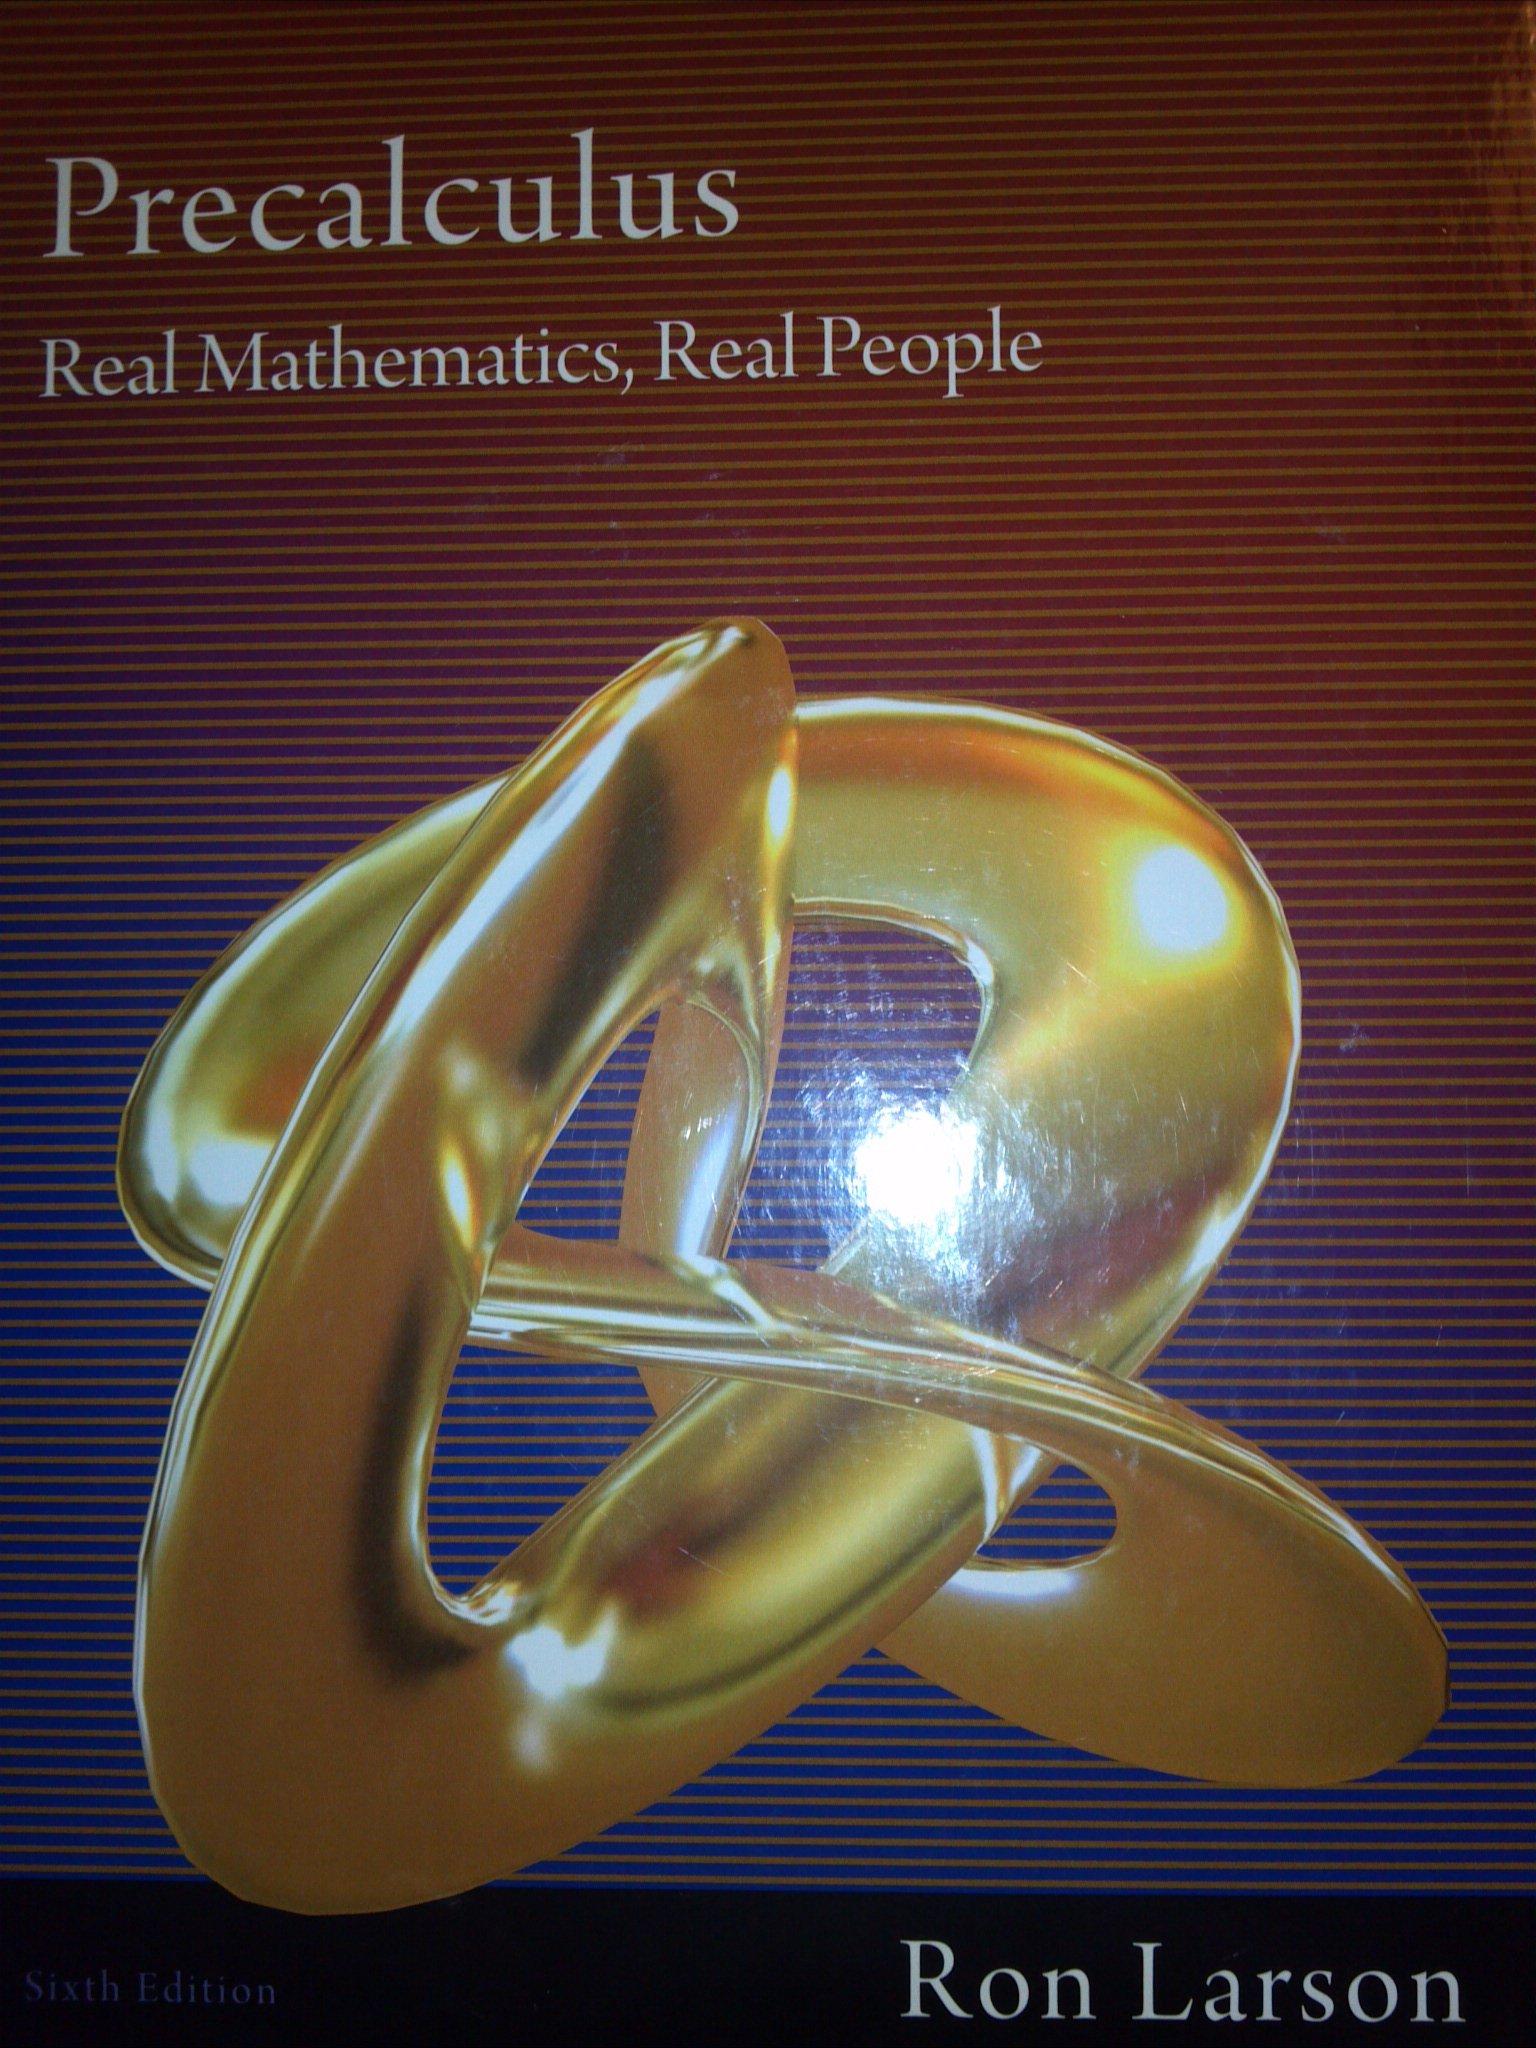 Precaclulus Real Mathematics, Real People Sixth Edition: Ron Larson:  9781111427634: Amazon.com: Books